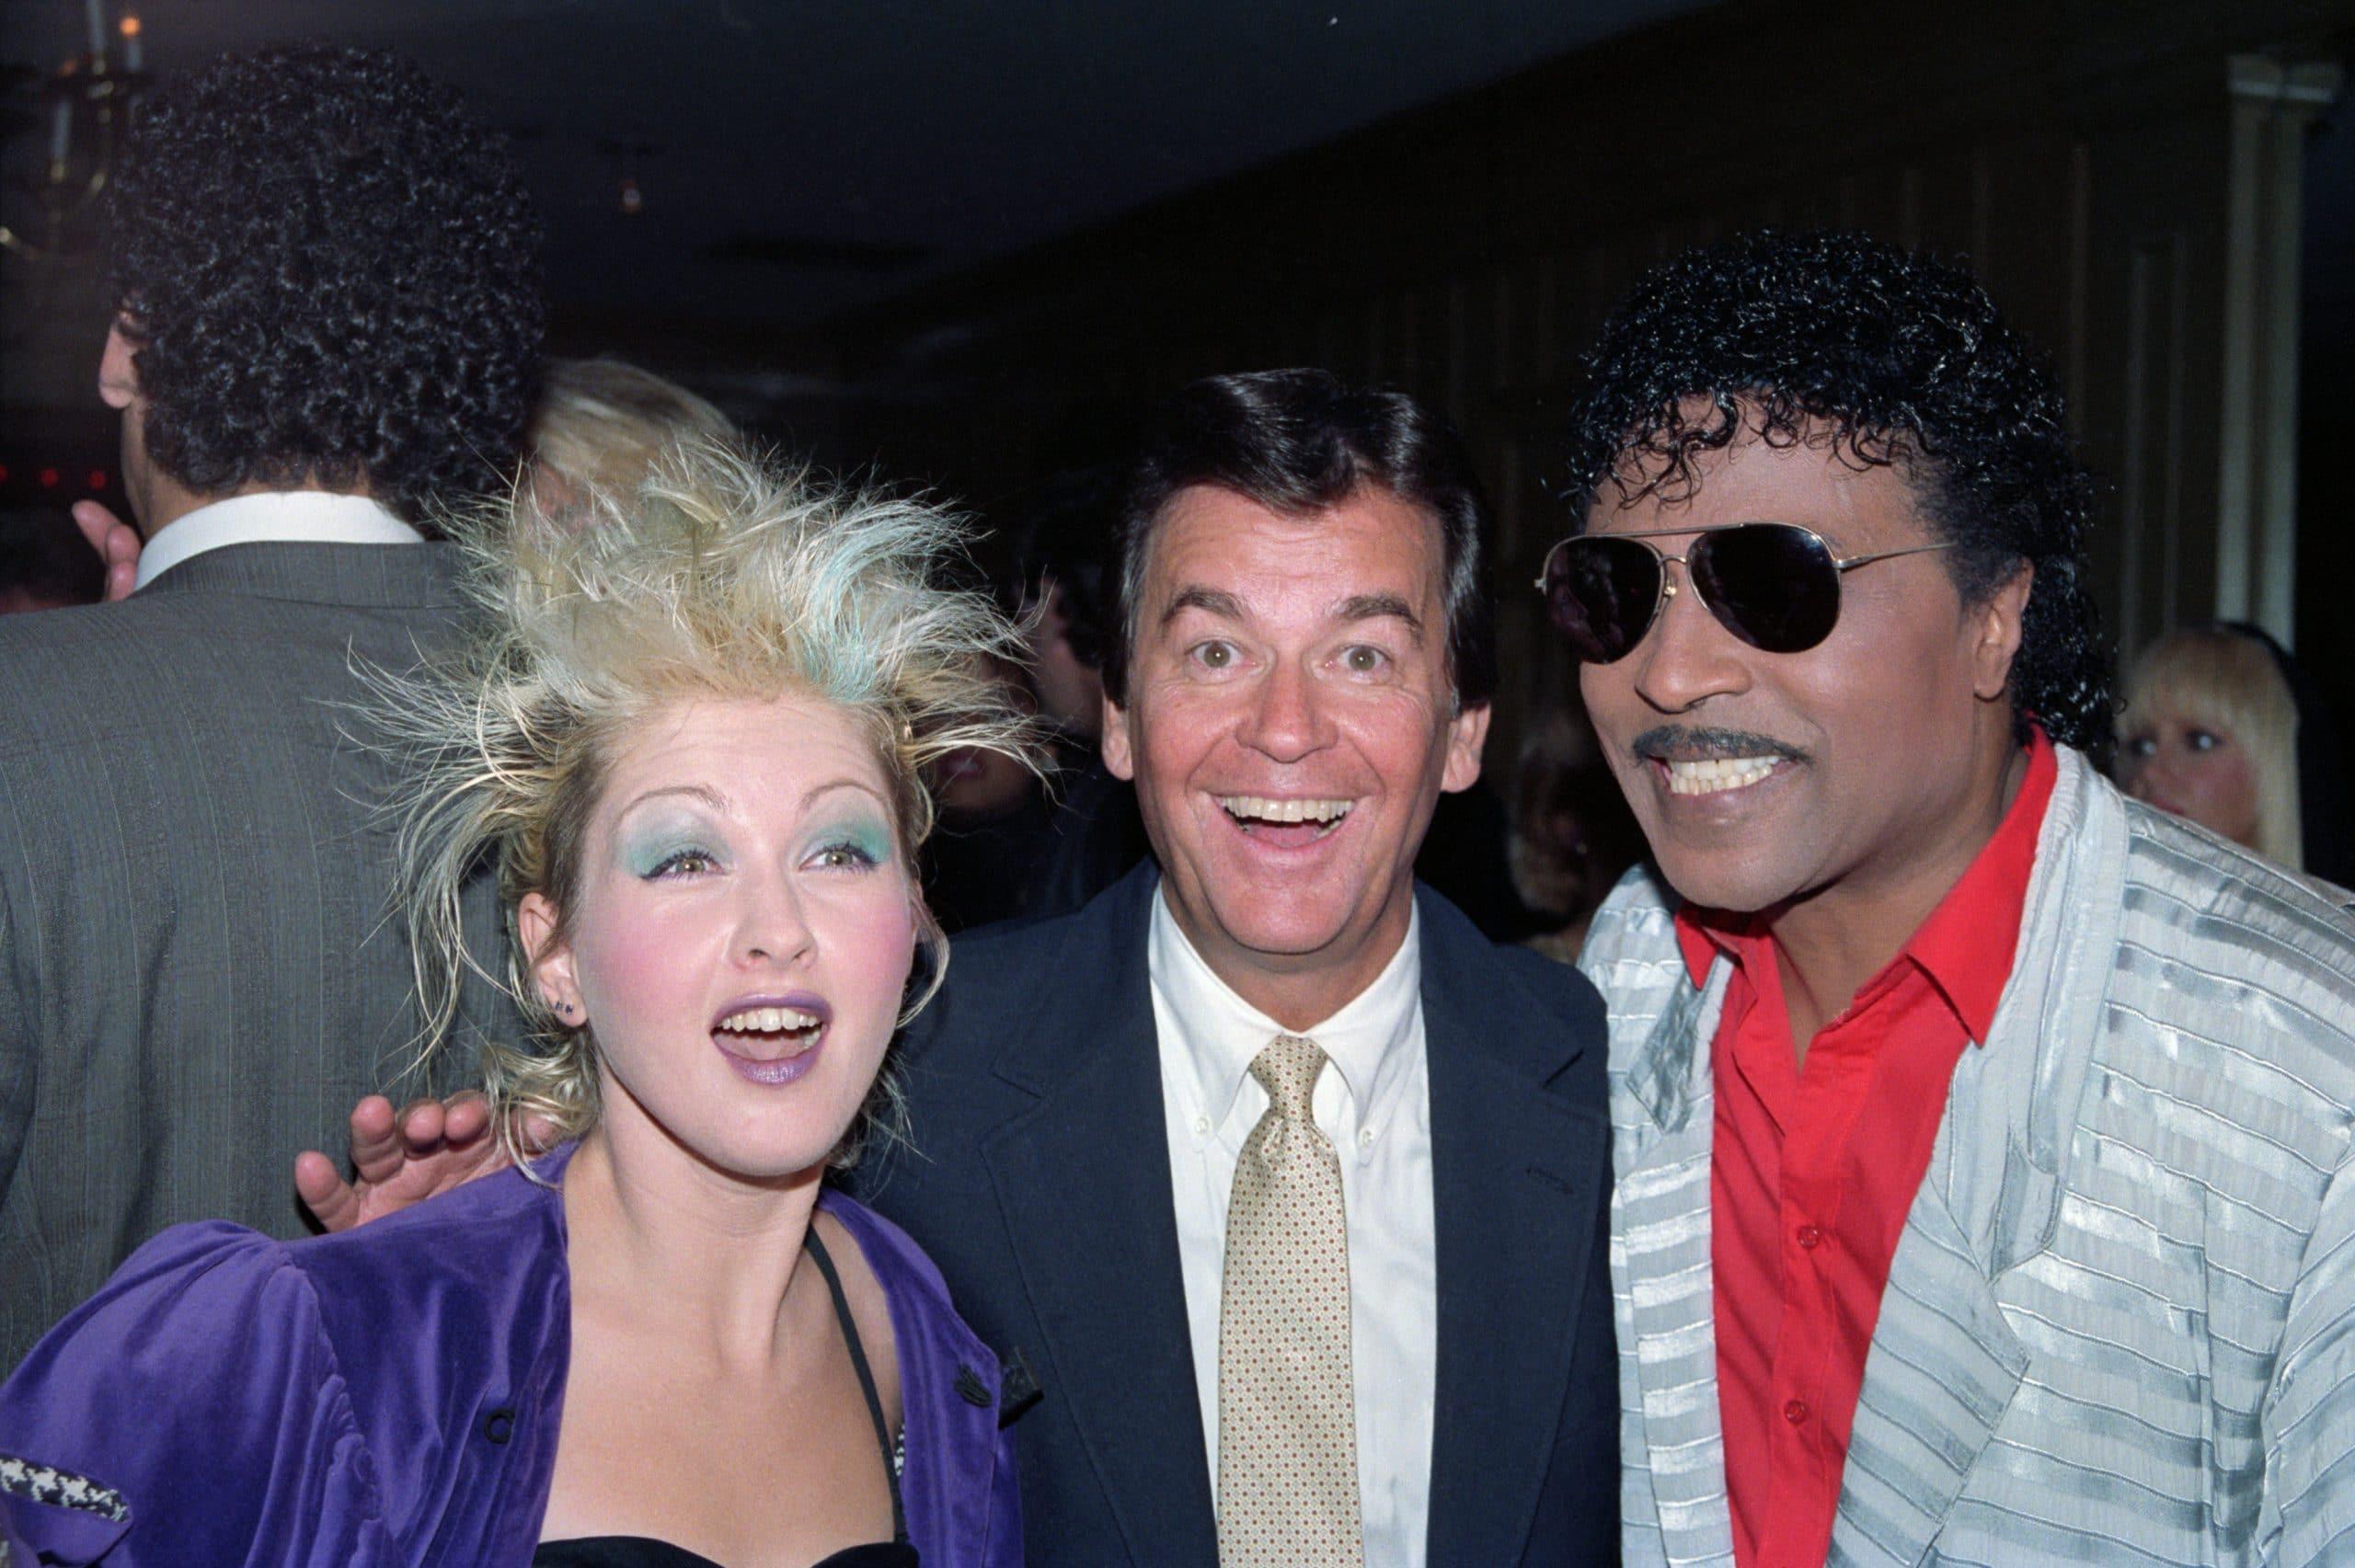 Cyndi Lauper, Dick Clark, and Little Richard